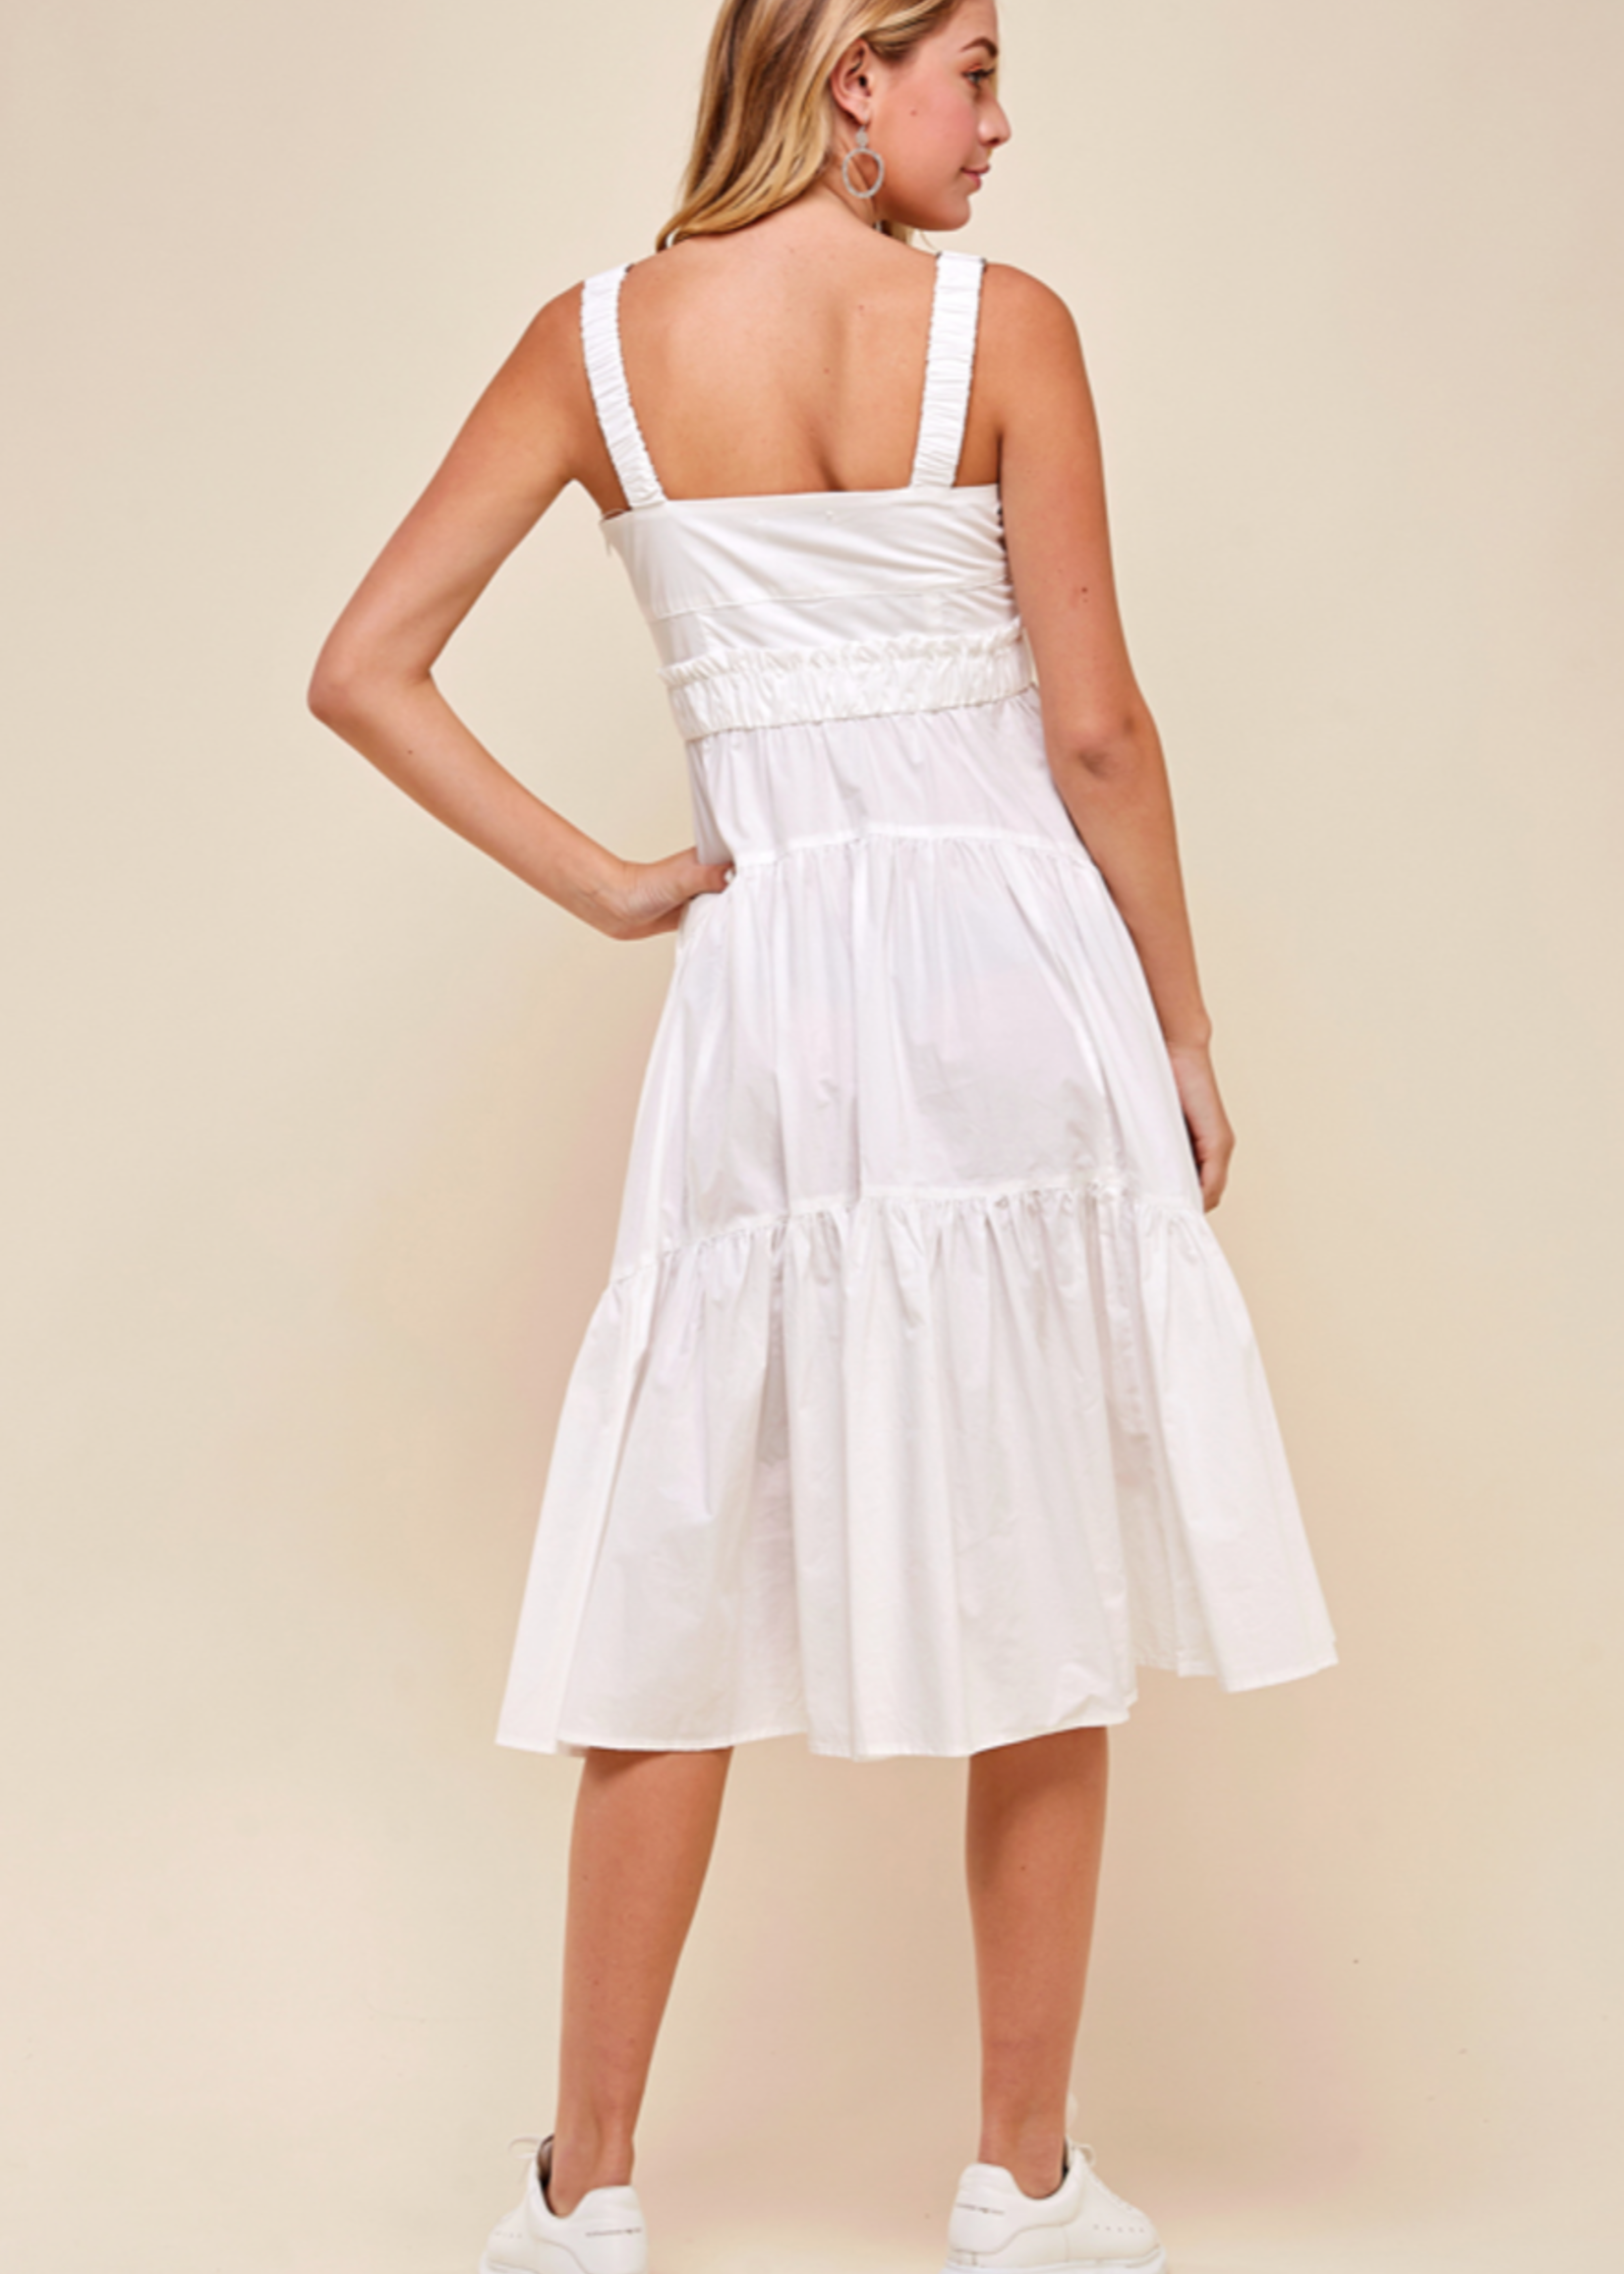 Pinch White Tiered Midi Dress